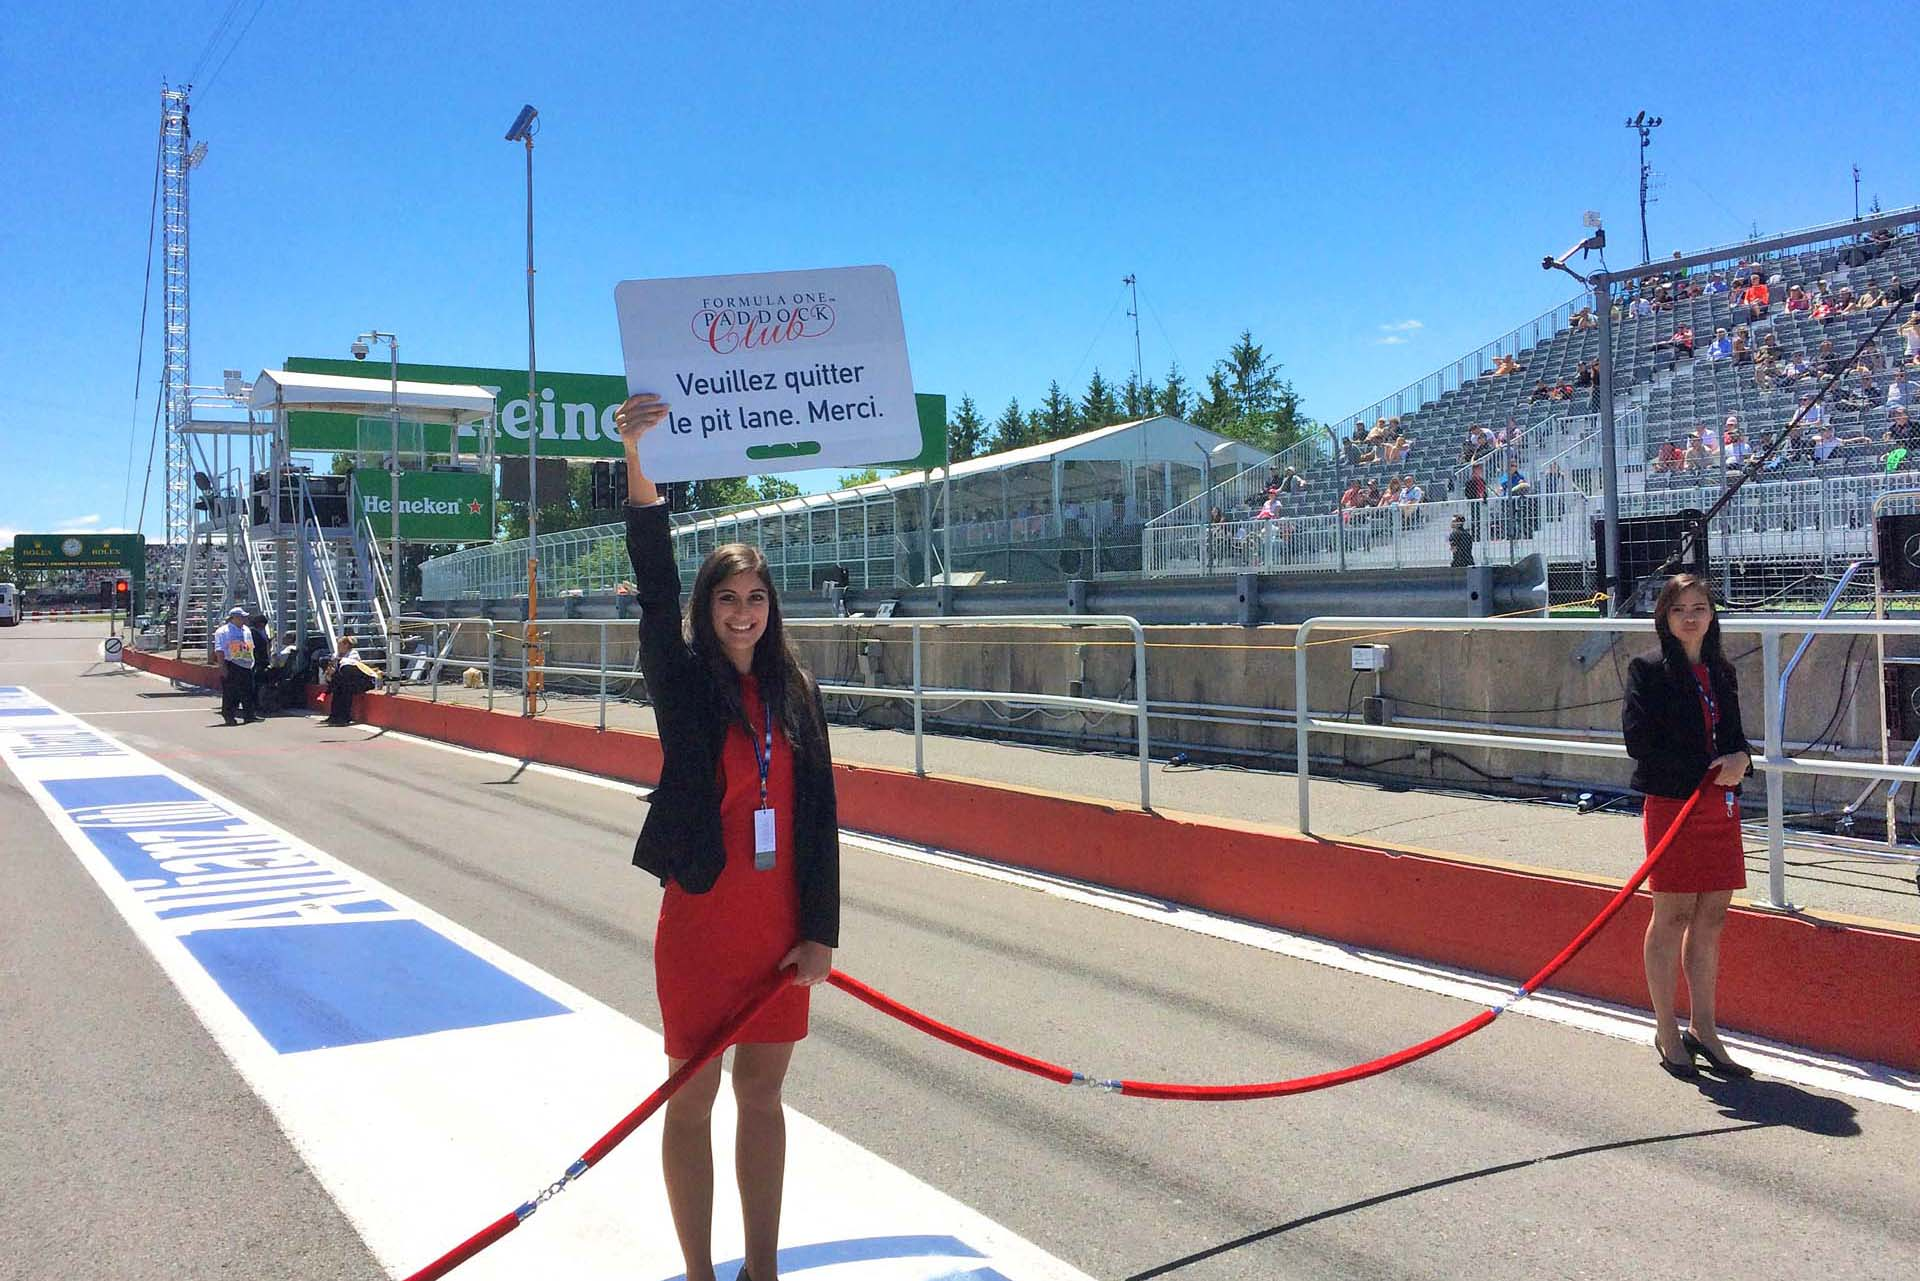 Montreal F1 Grand Prix Weekend